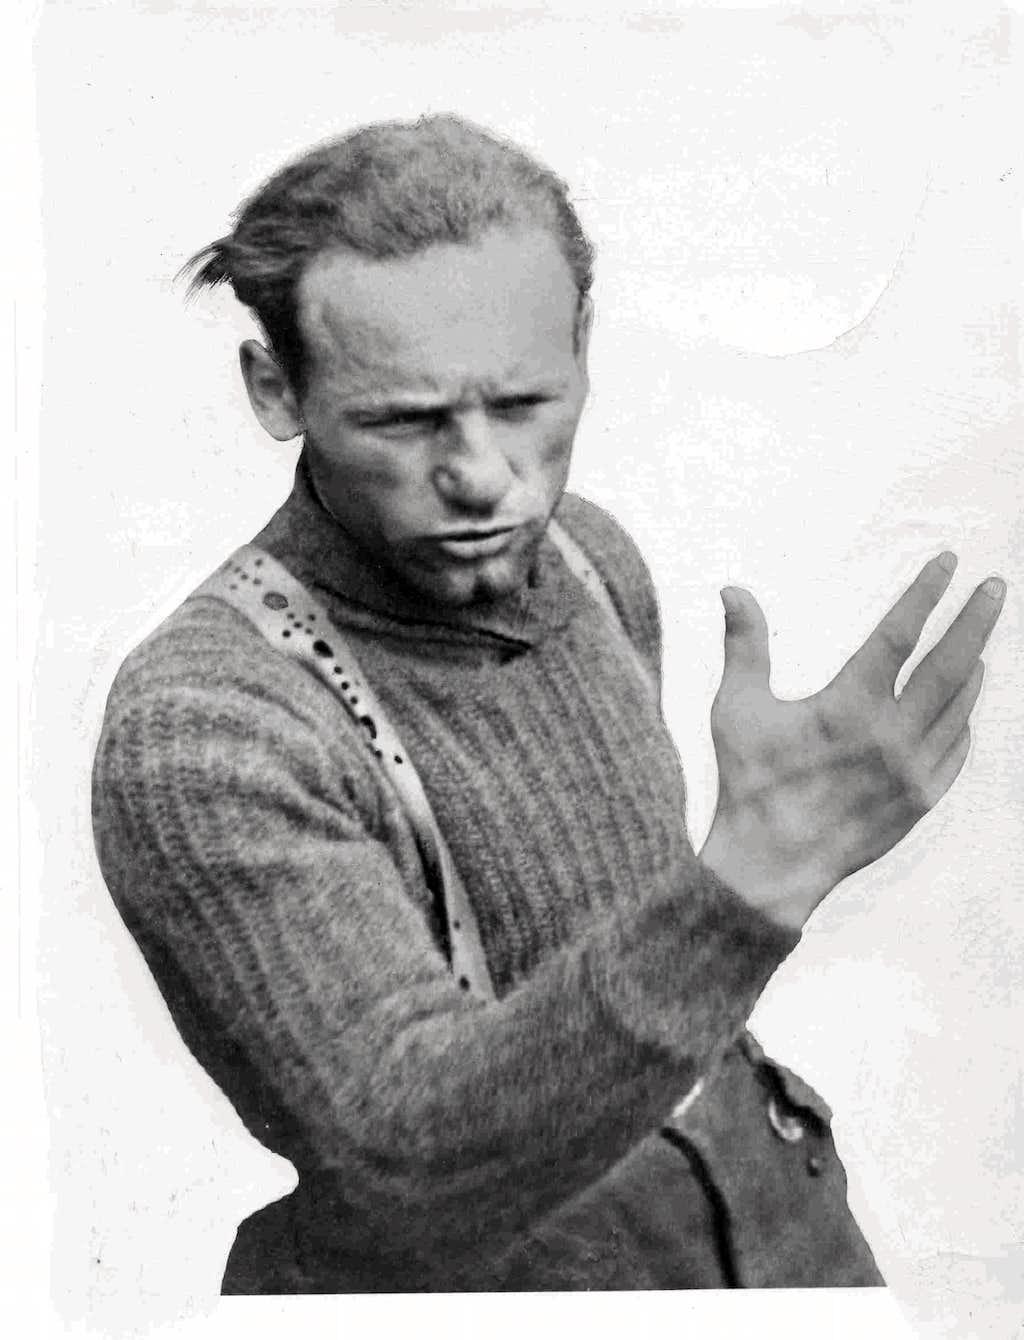 Riccardo Cassin 1938